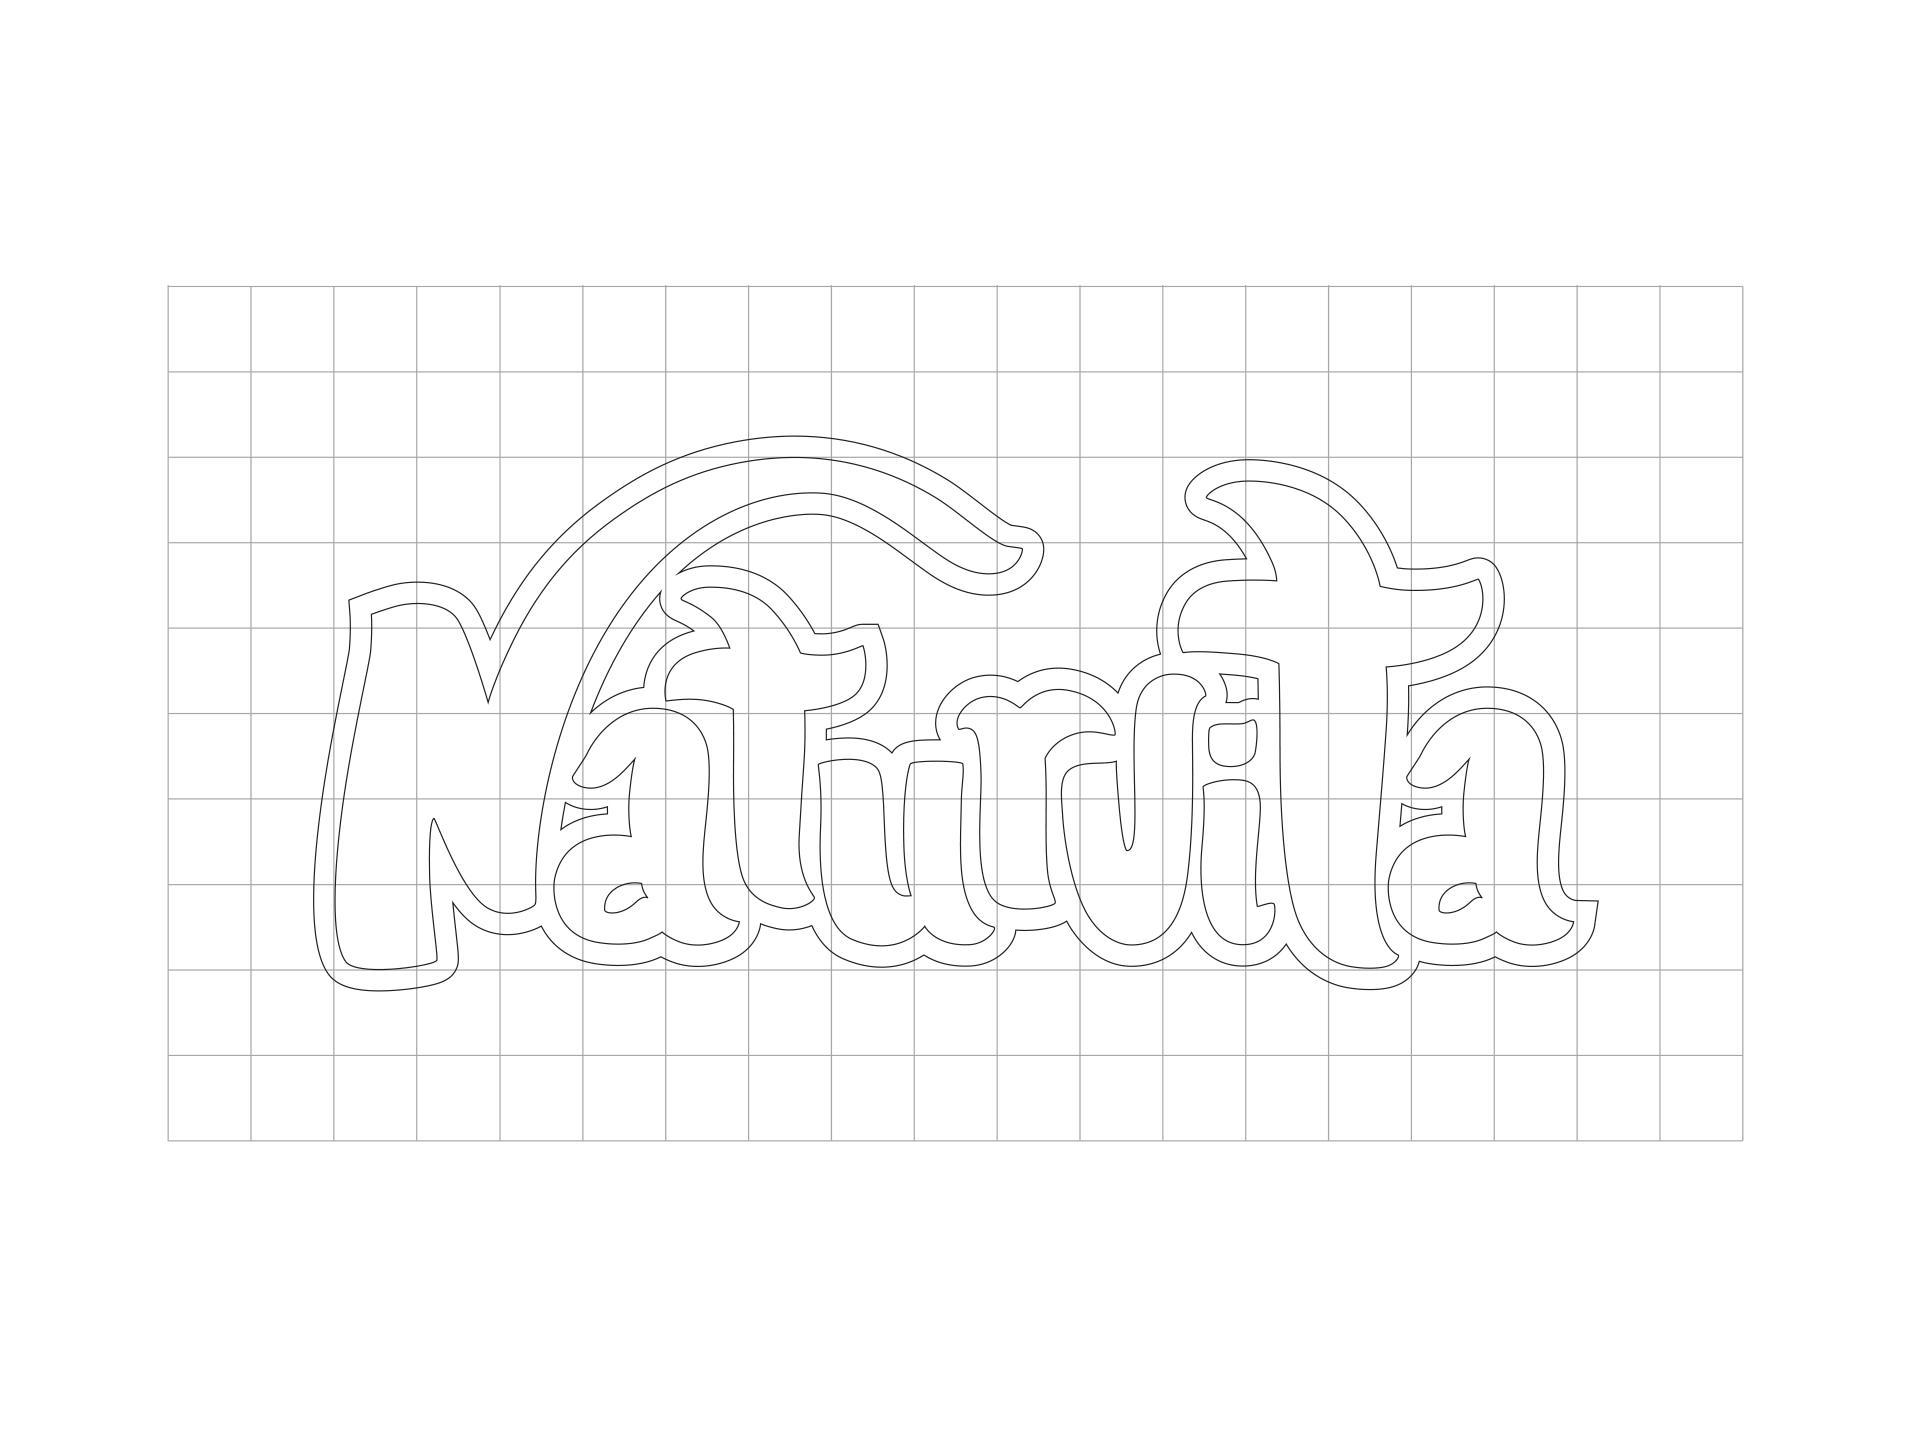 Naturvita diseño de identidad corporativa